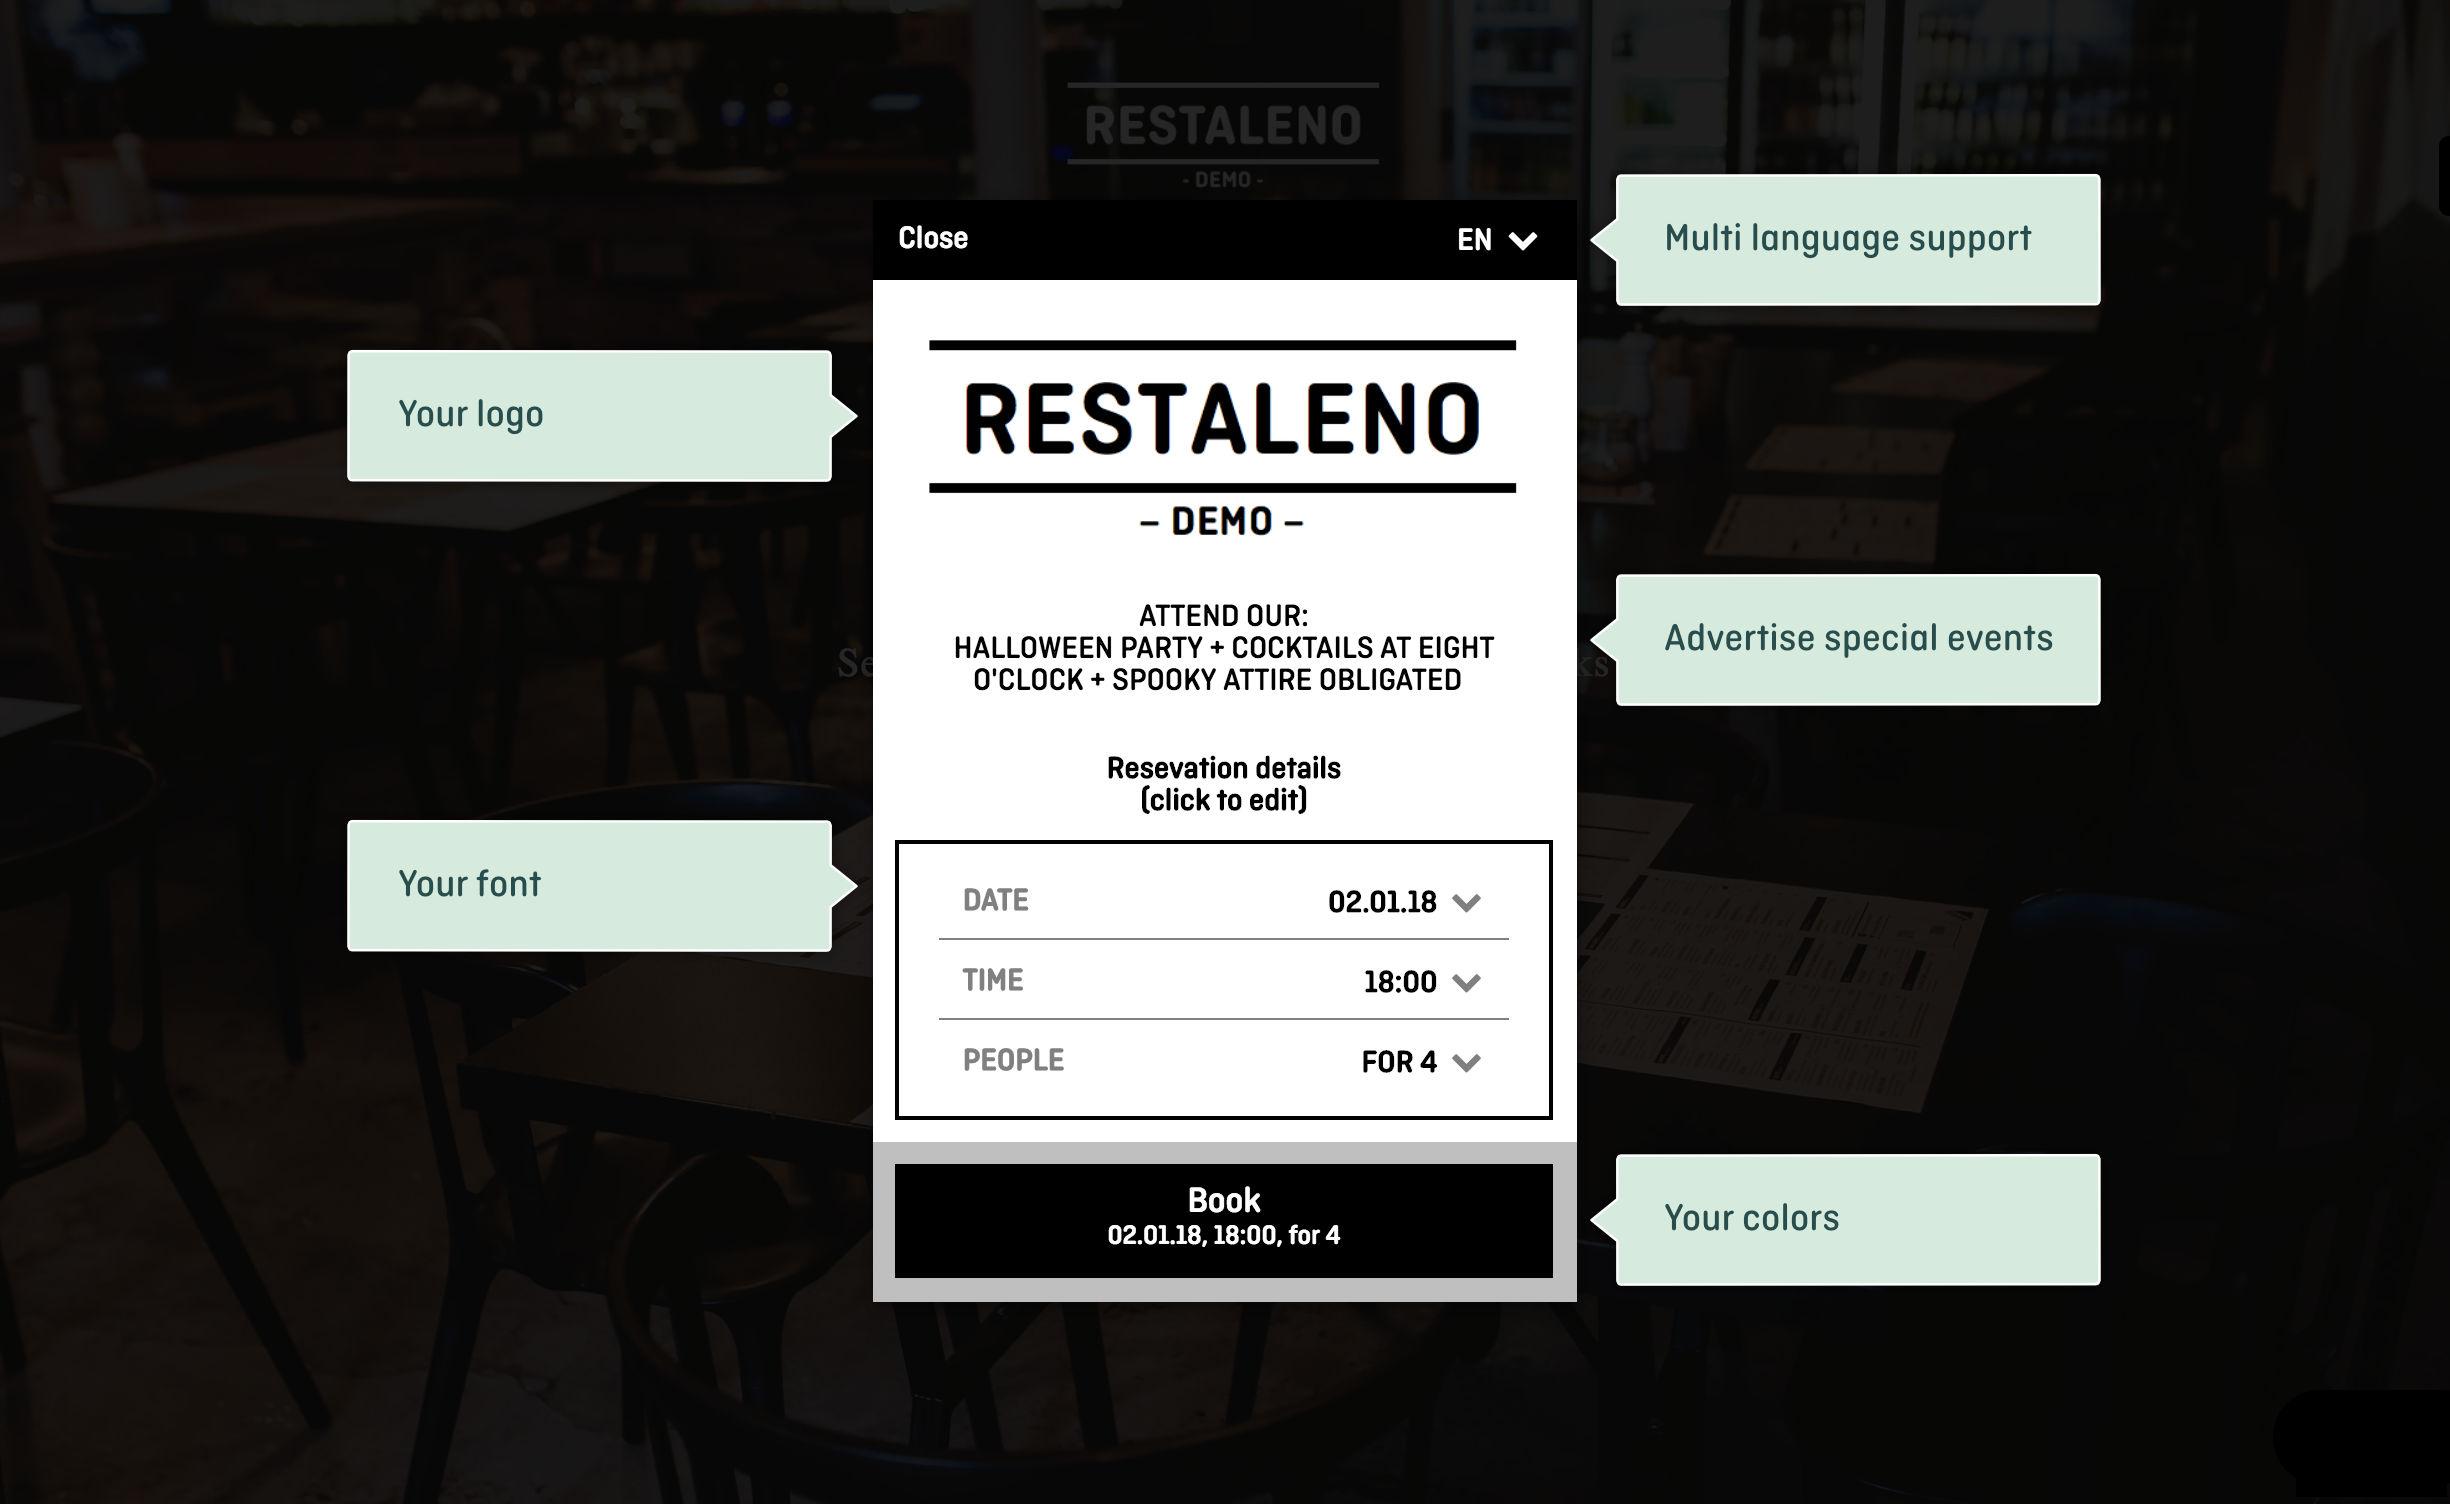 aleno Restaurant Reservations